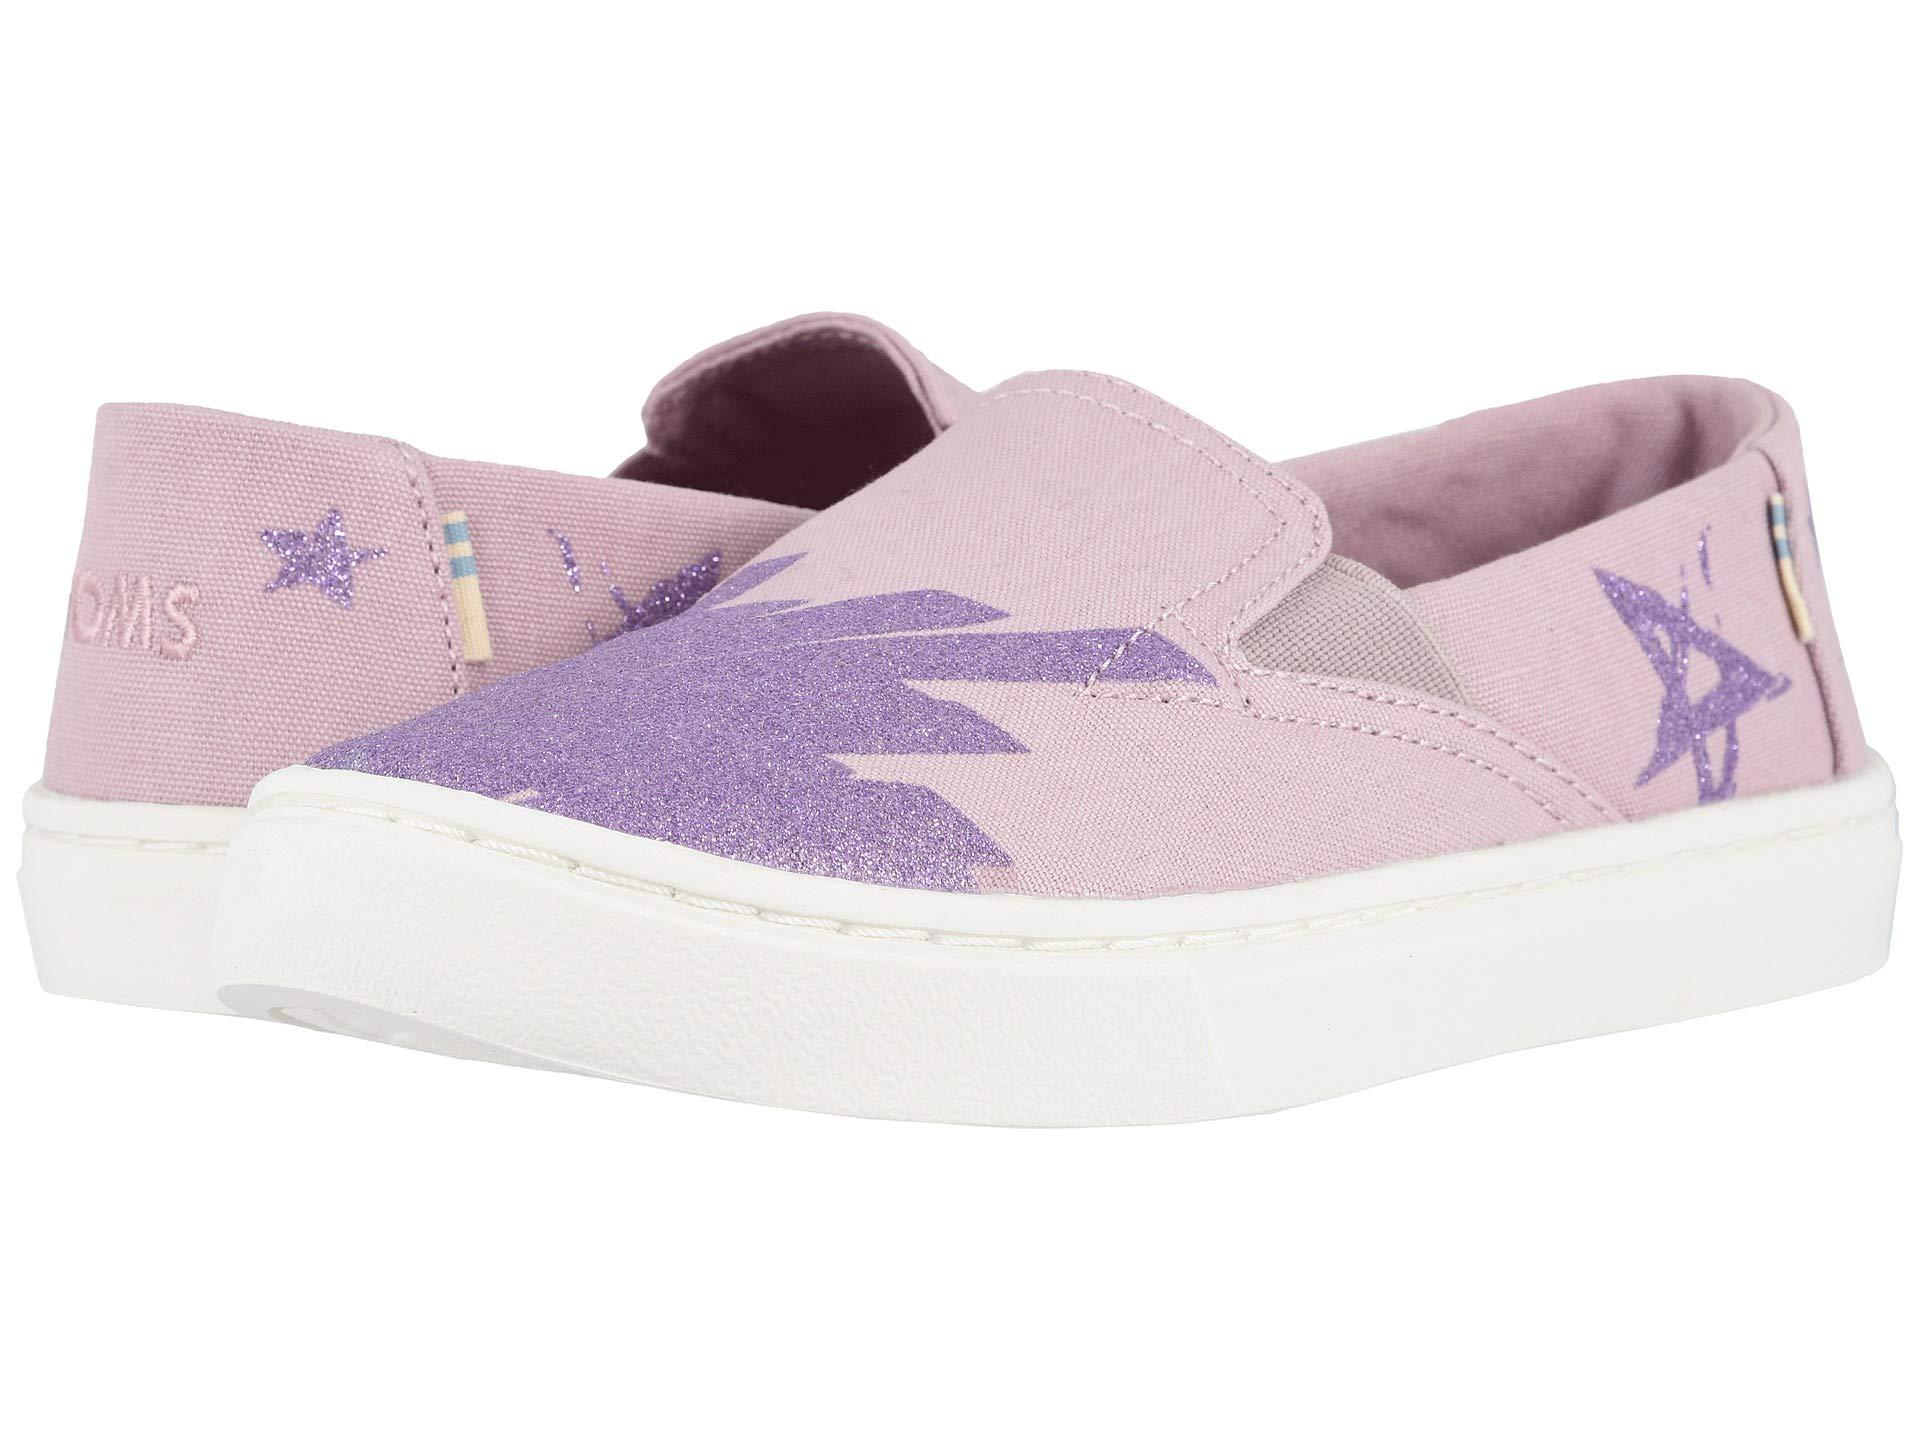 TOMS Youth Luca Slip-On Shoes, Size: 3.5 M US Big Kid, Color: Brnsh Lilac Glt Star by TOMS Kids (Image #7)